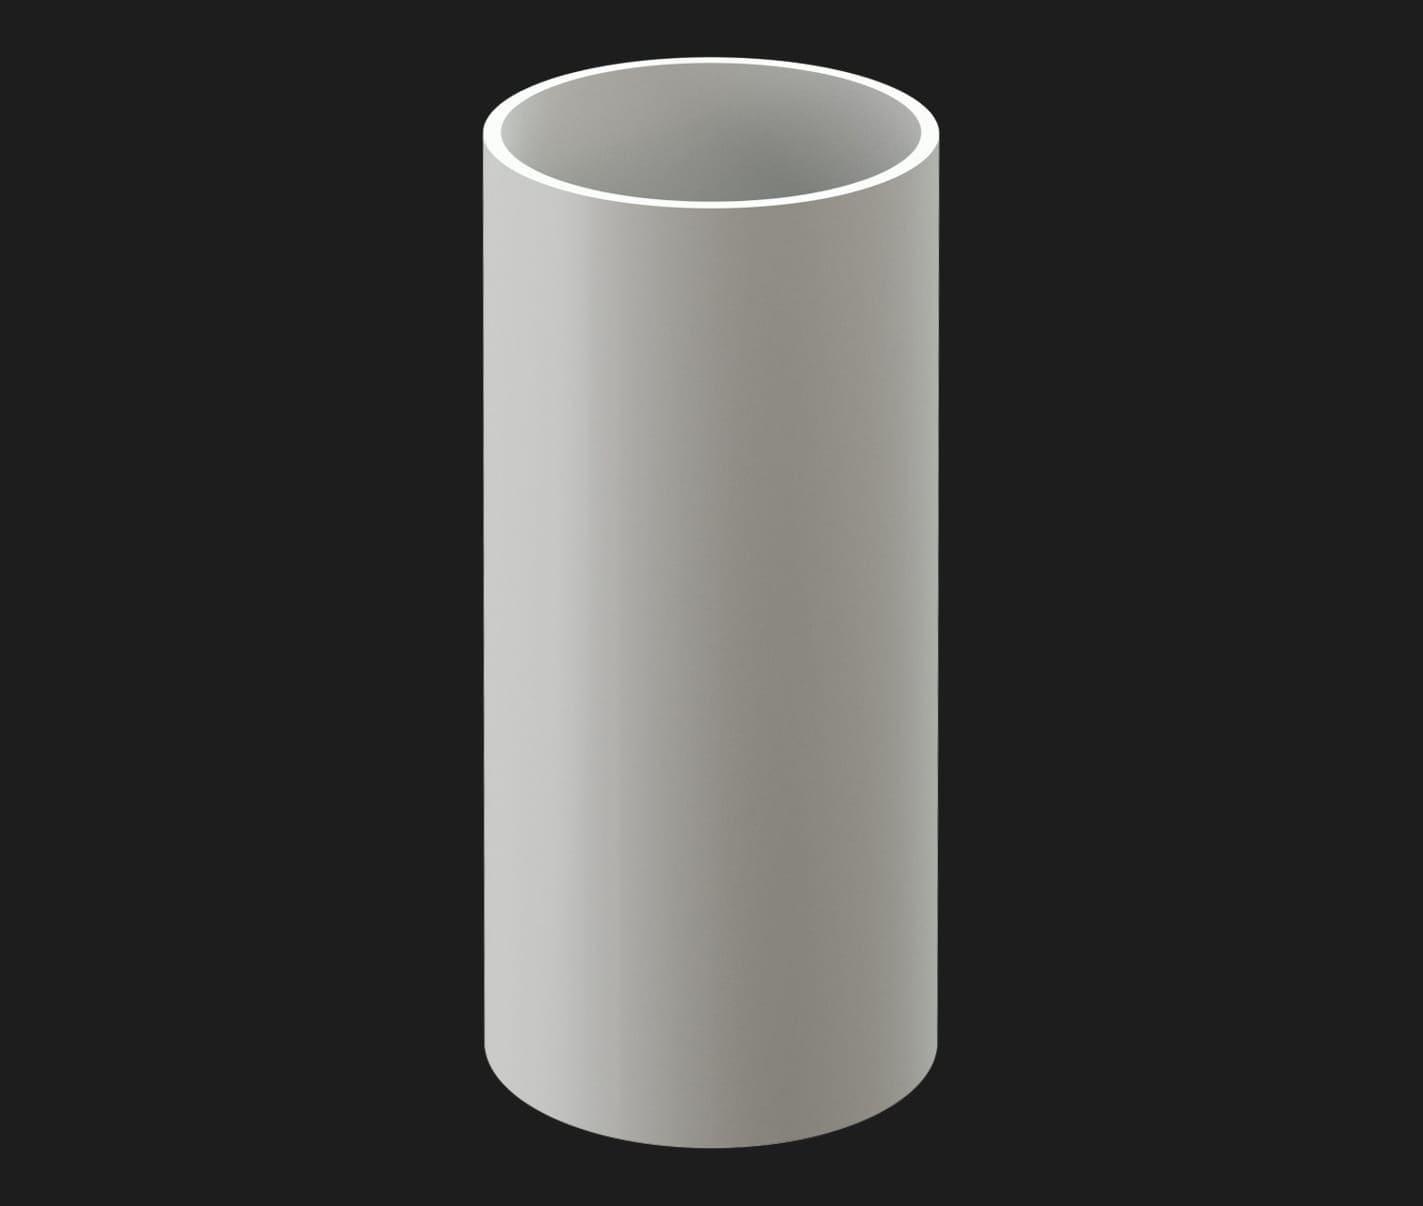 Döcke PREMIUM Труба водосточная 1м (Пломбир)